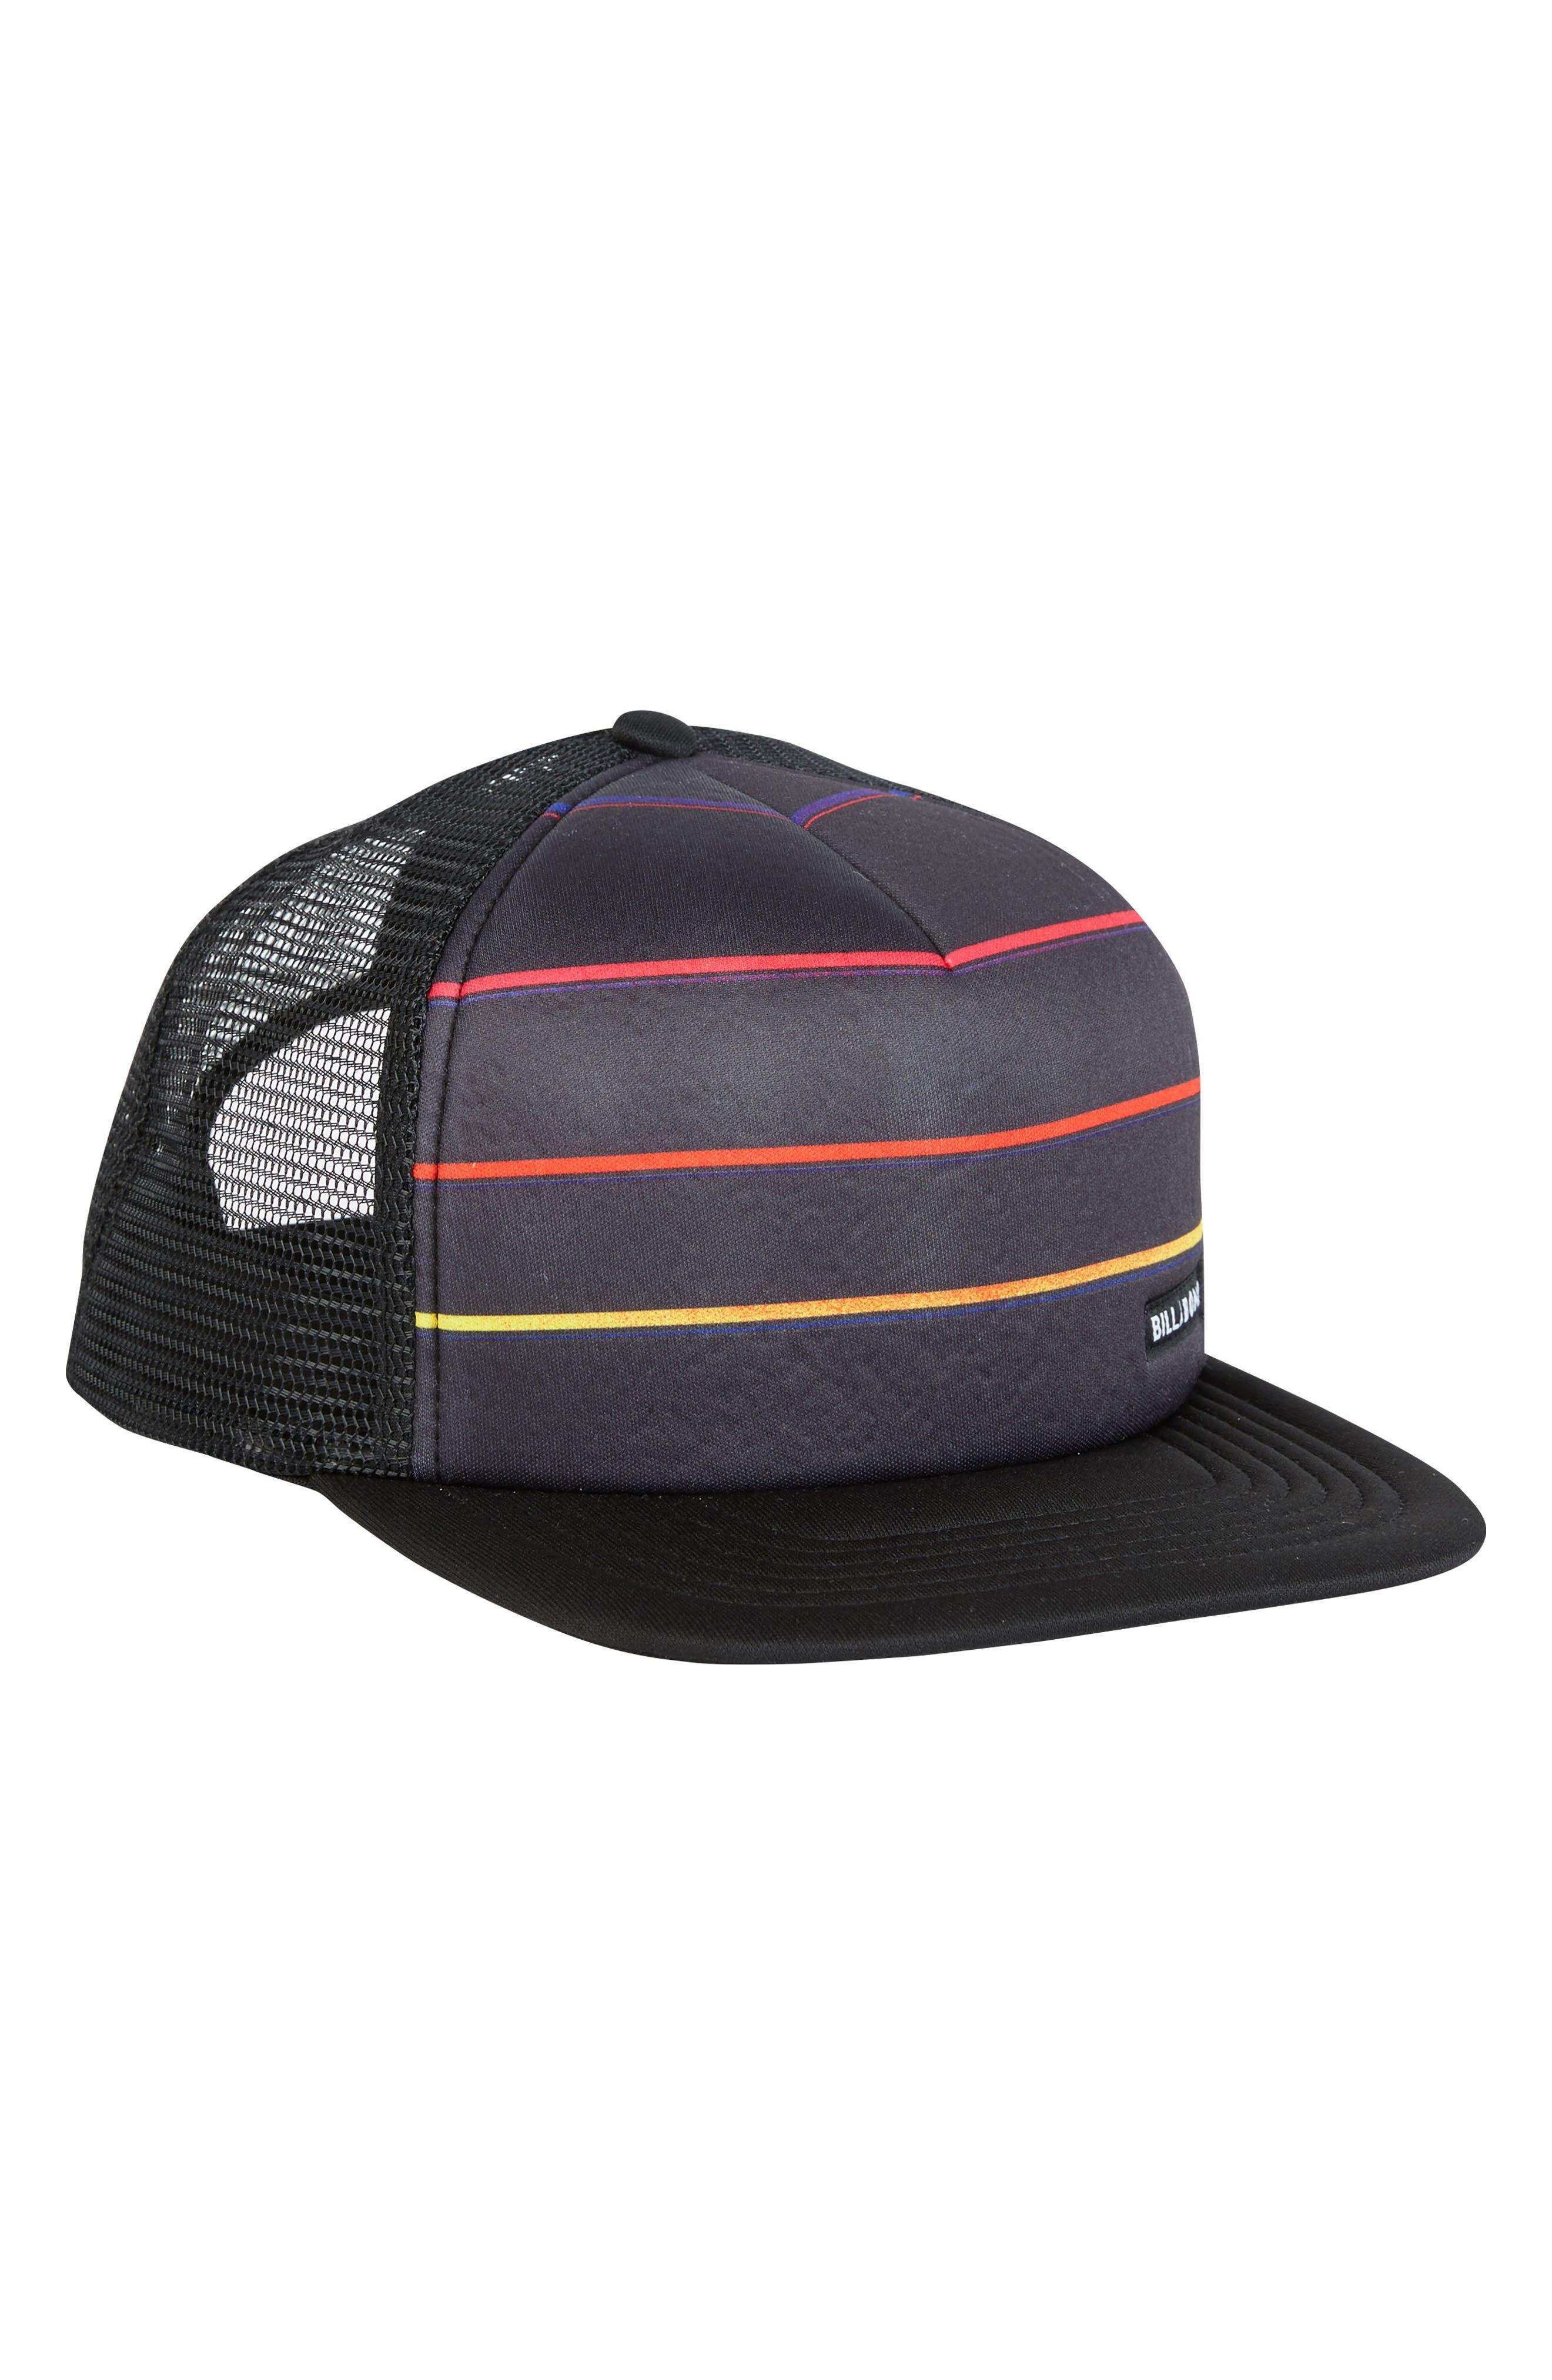 73 Snapback Trucker Hat,                         Main,                         color, 001